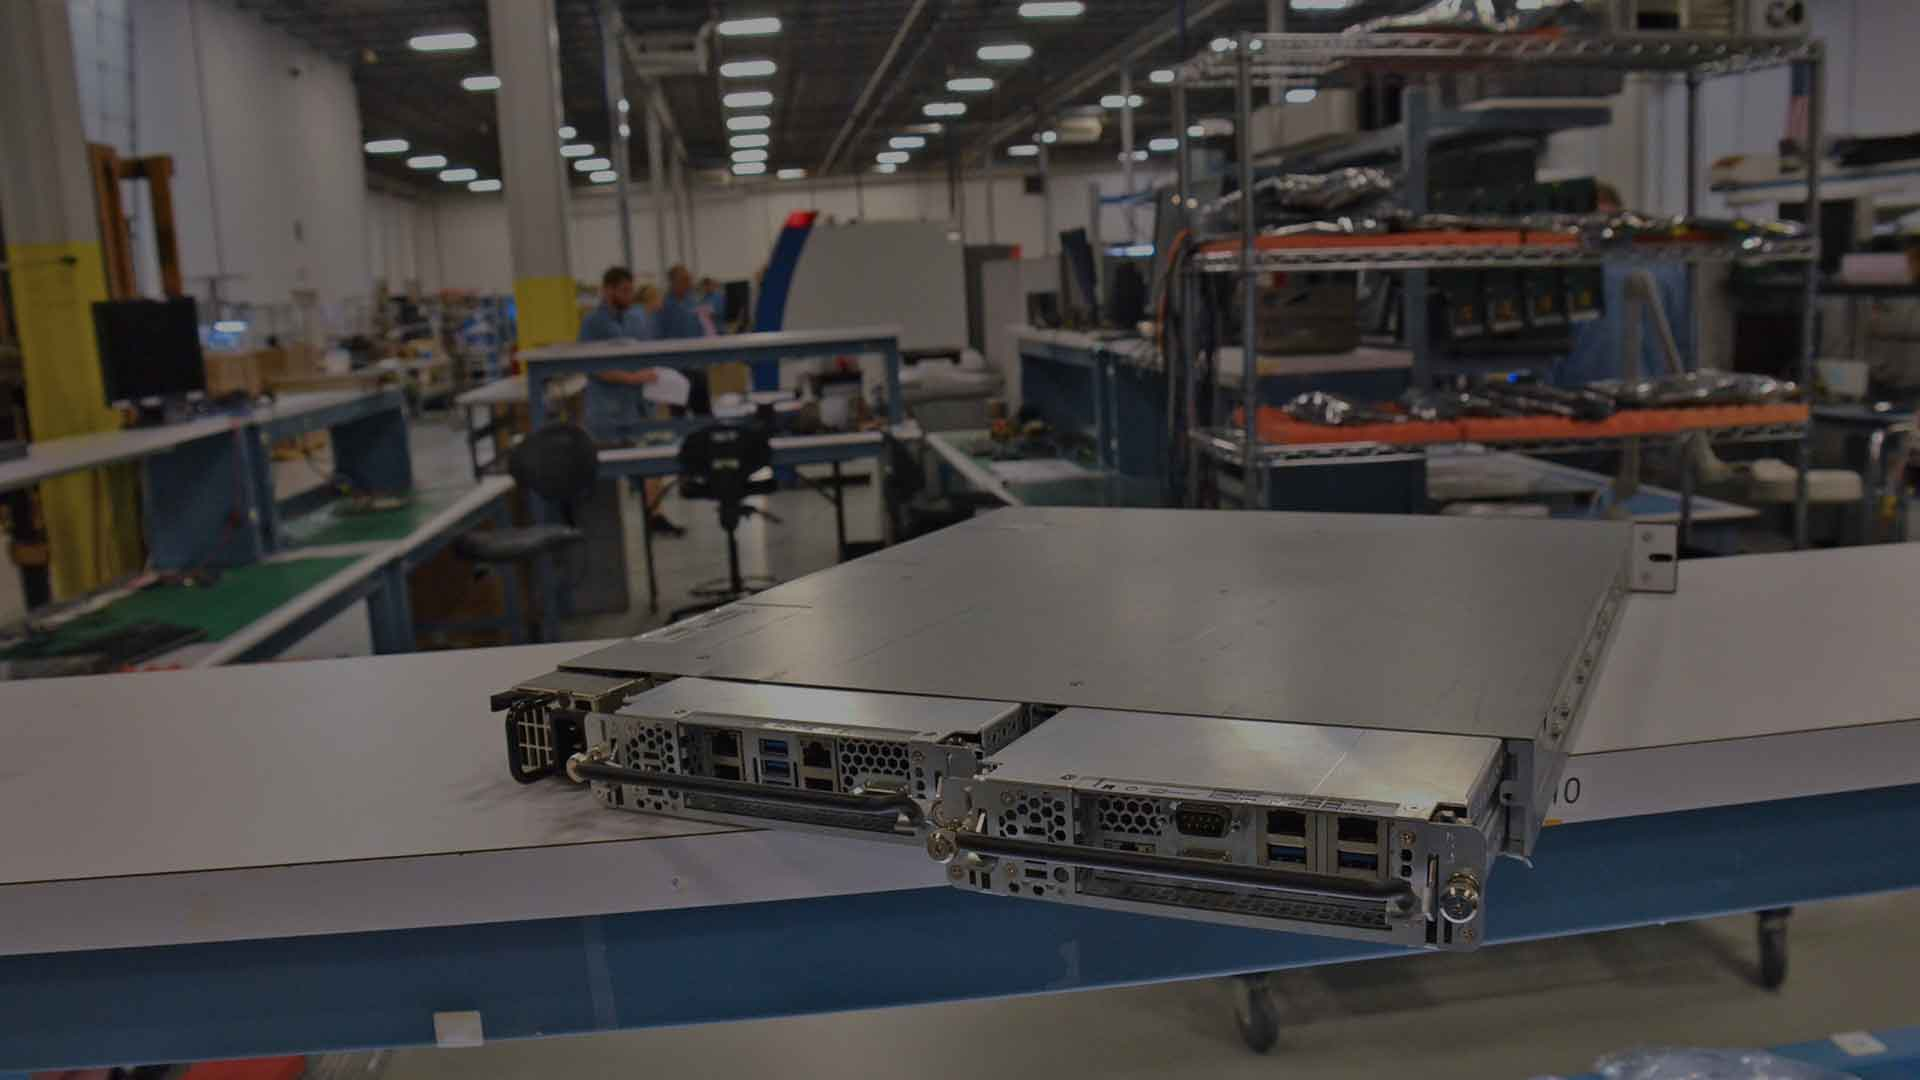 Trenton-systems-servers-military-1